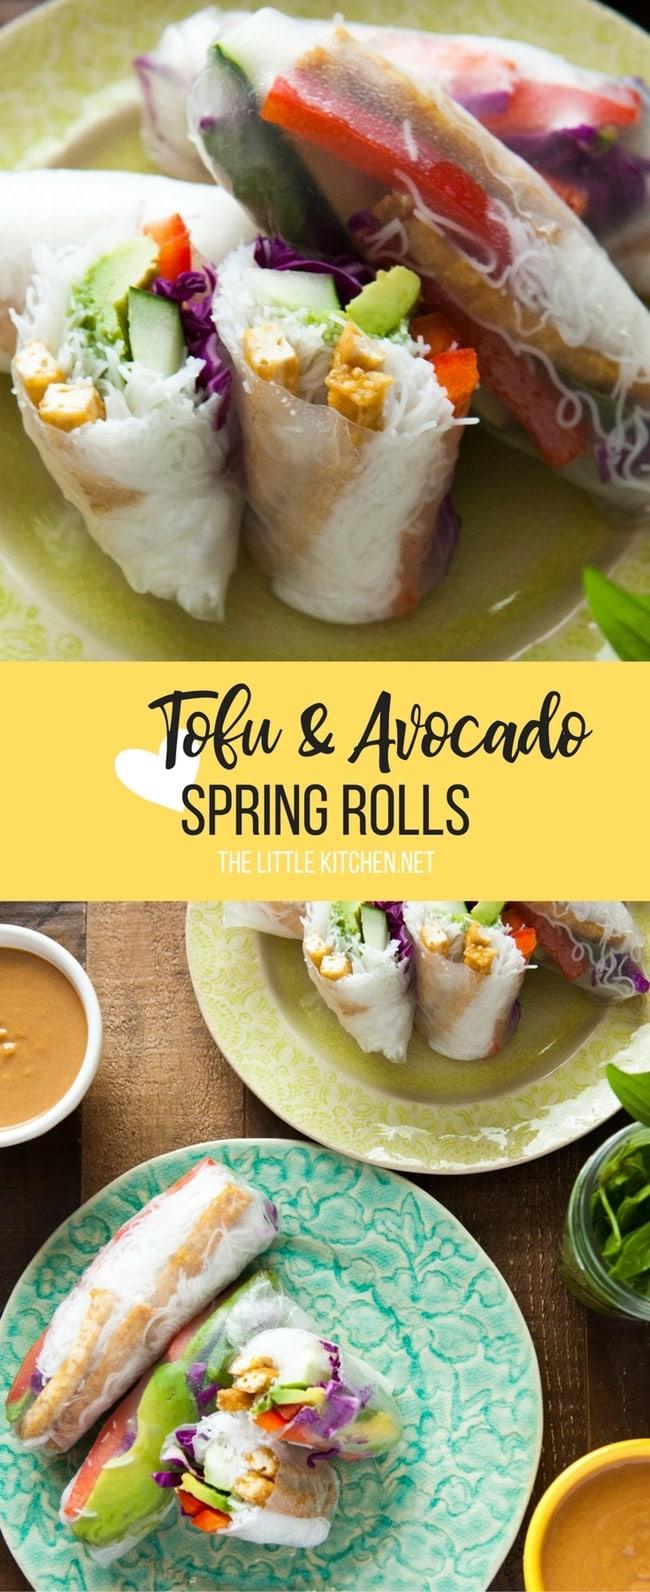 Tofu Avocado Spring Rolls With Peanut Dipping Sauce